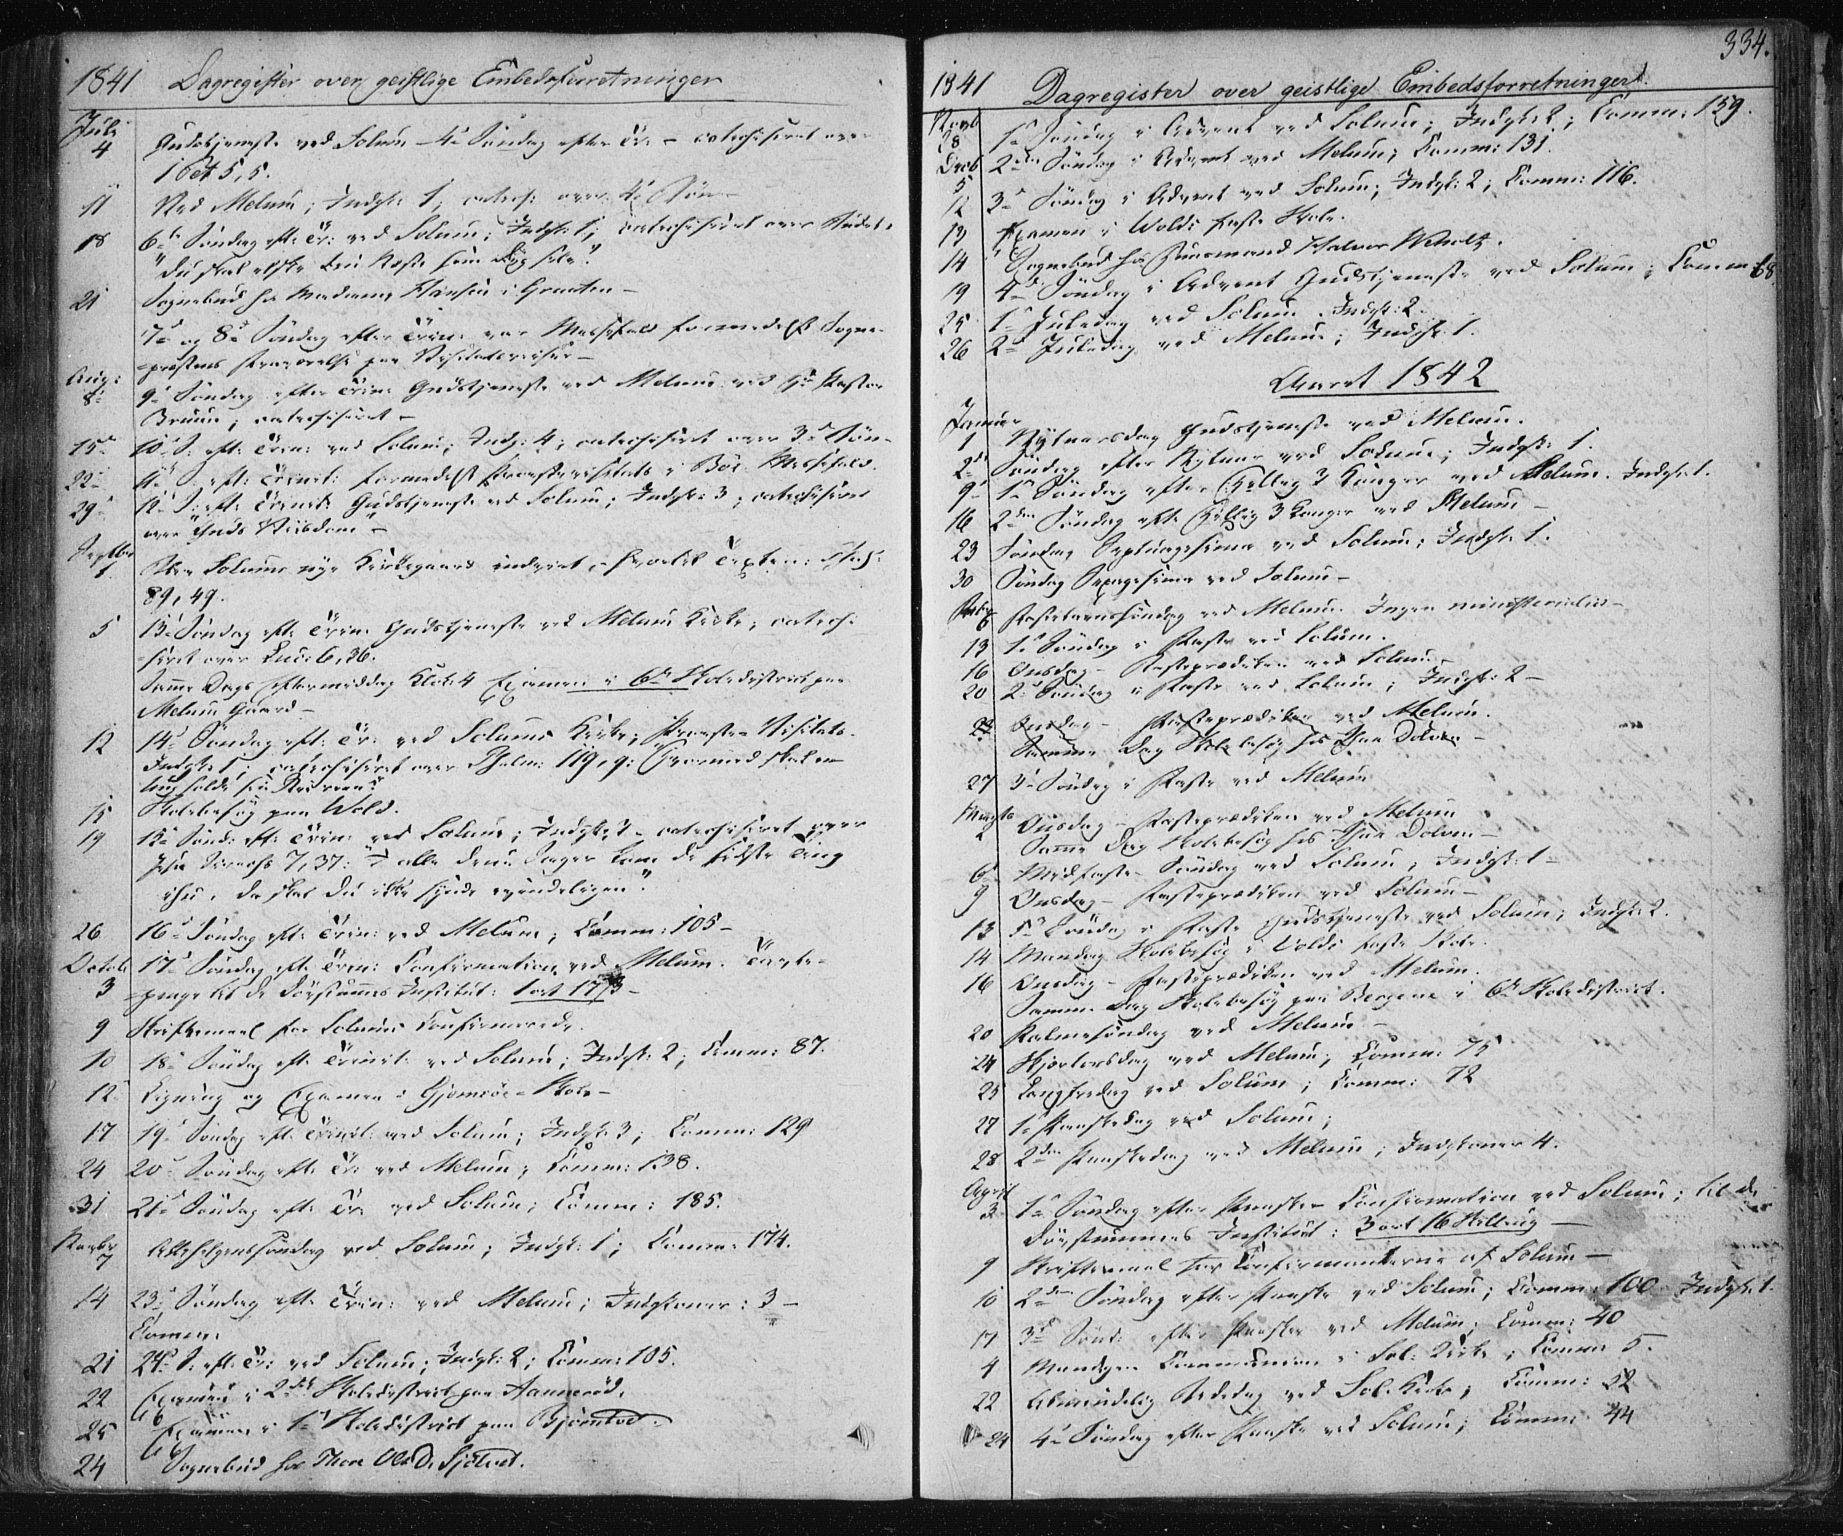 SAKO, Solum kirkebøker, F/Fa/L0005: Ministerialbok nr. I 5, 1833-1843, s. 334